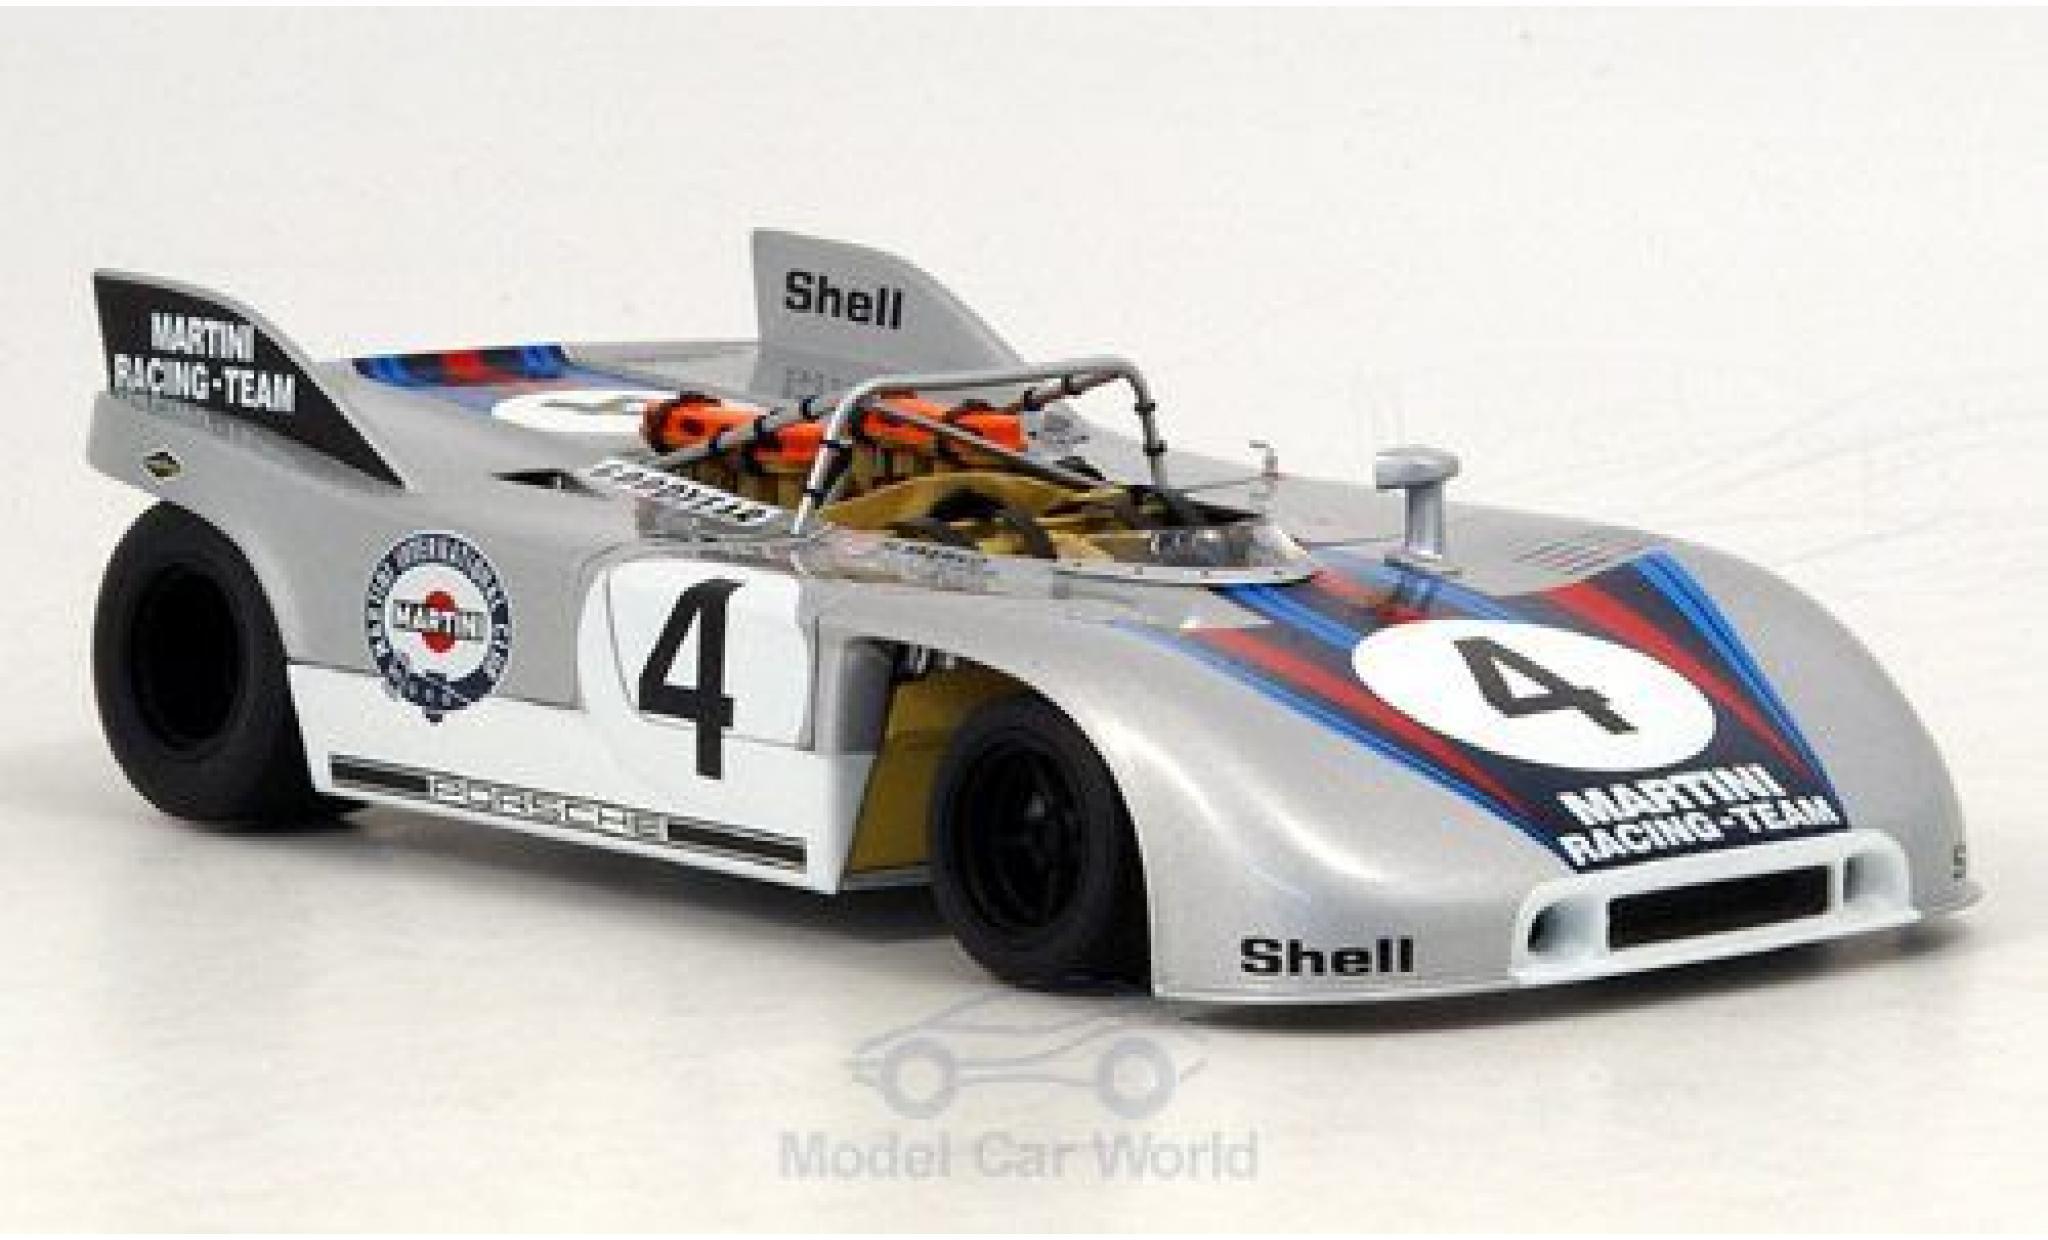 Porsche 908 1/18 AUTOart /3 No.4 Martini Racing Martini Nürburgring 1971 Dr.Marko/G.van Lennep